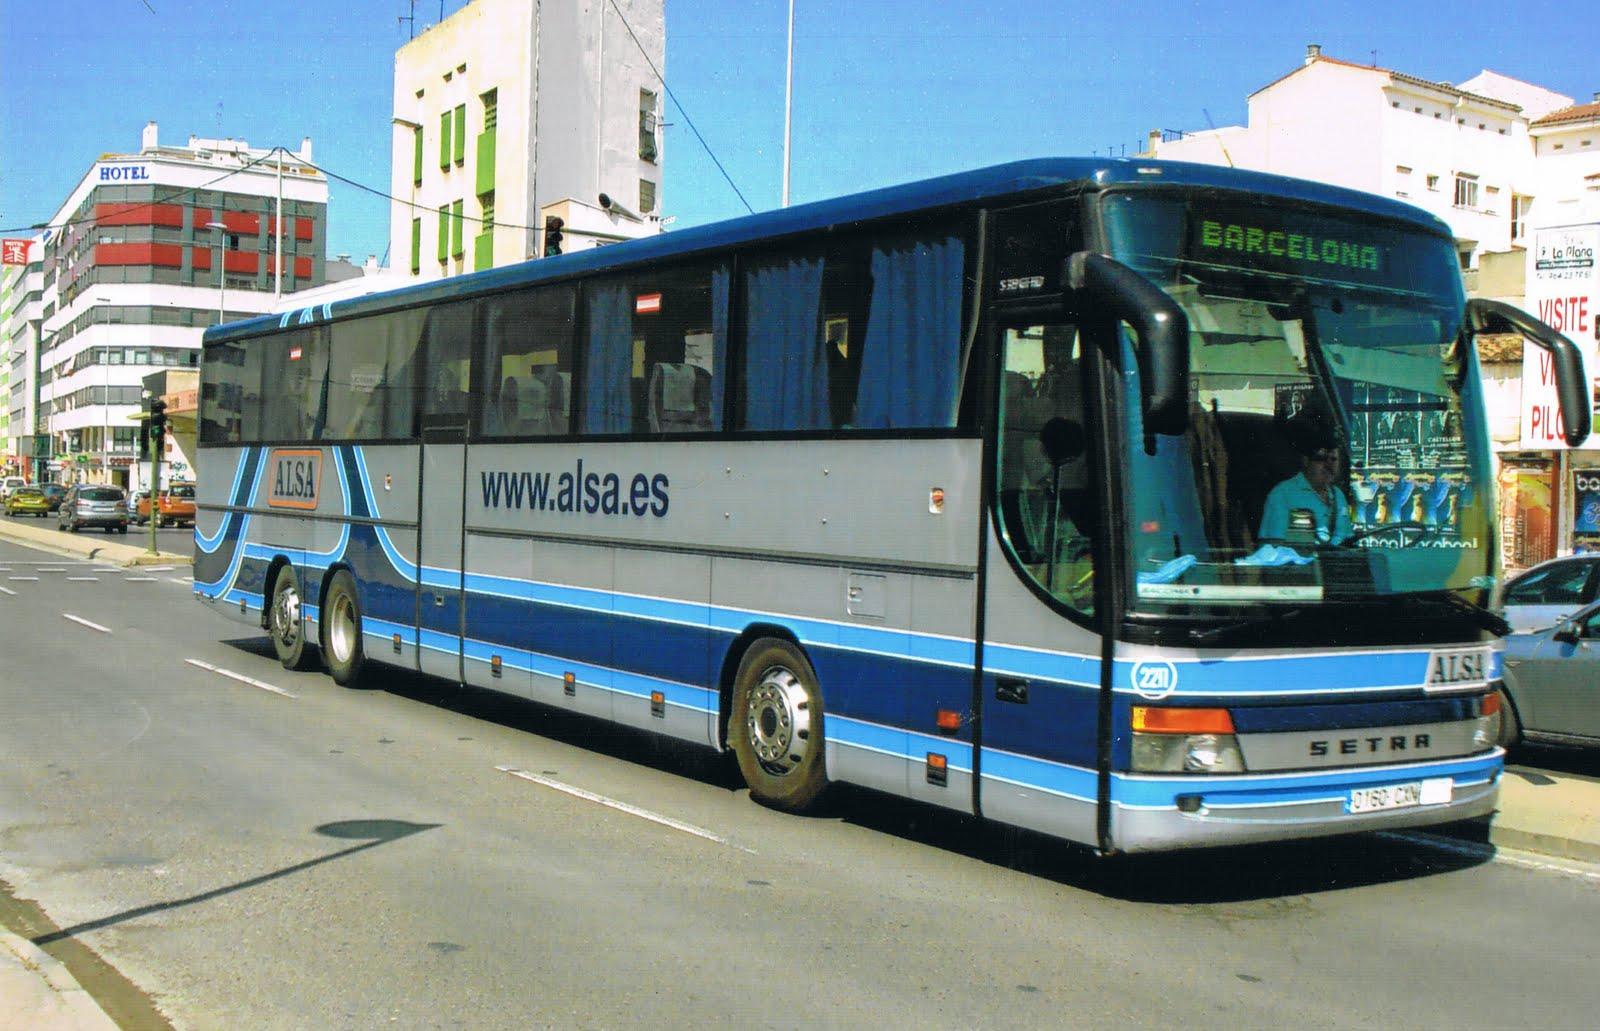 Las paranoias de misaoshi febrero 2011 - Autobuses larga distancia ...